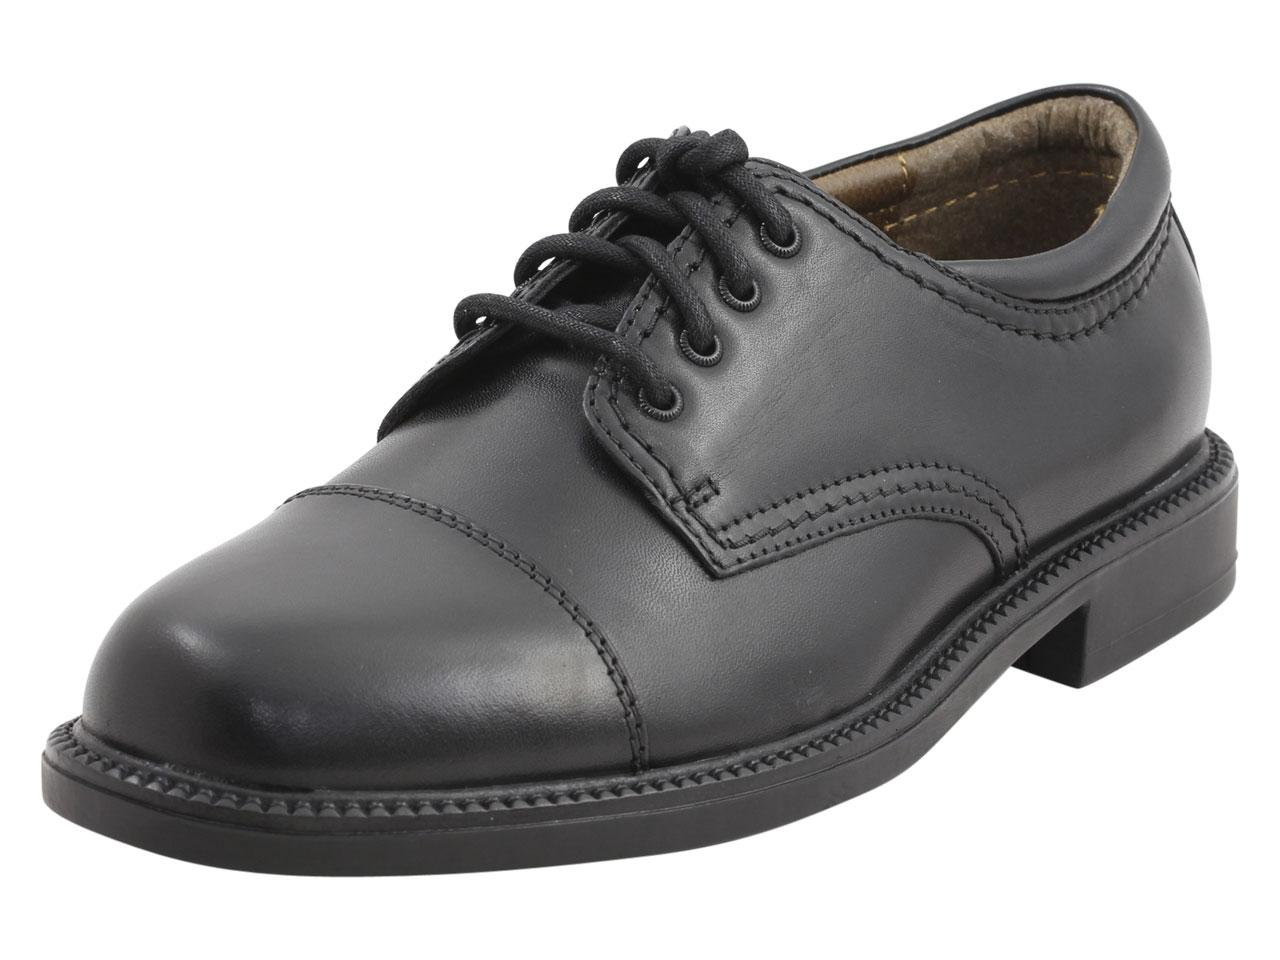 Image of Dockers Men's Gordon Cap Toe Oxfords Shoes - Black - 12 E(W) US